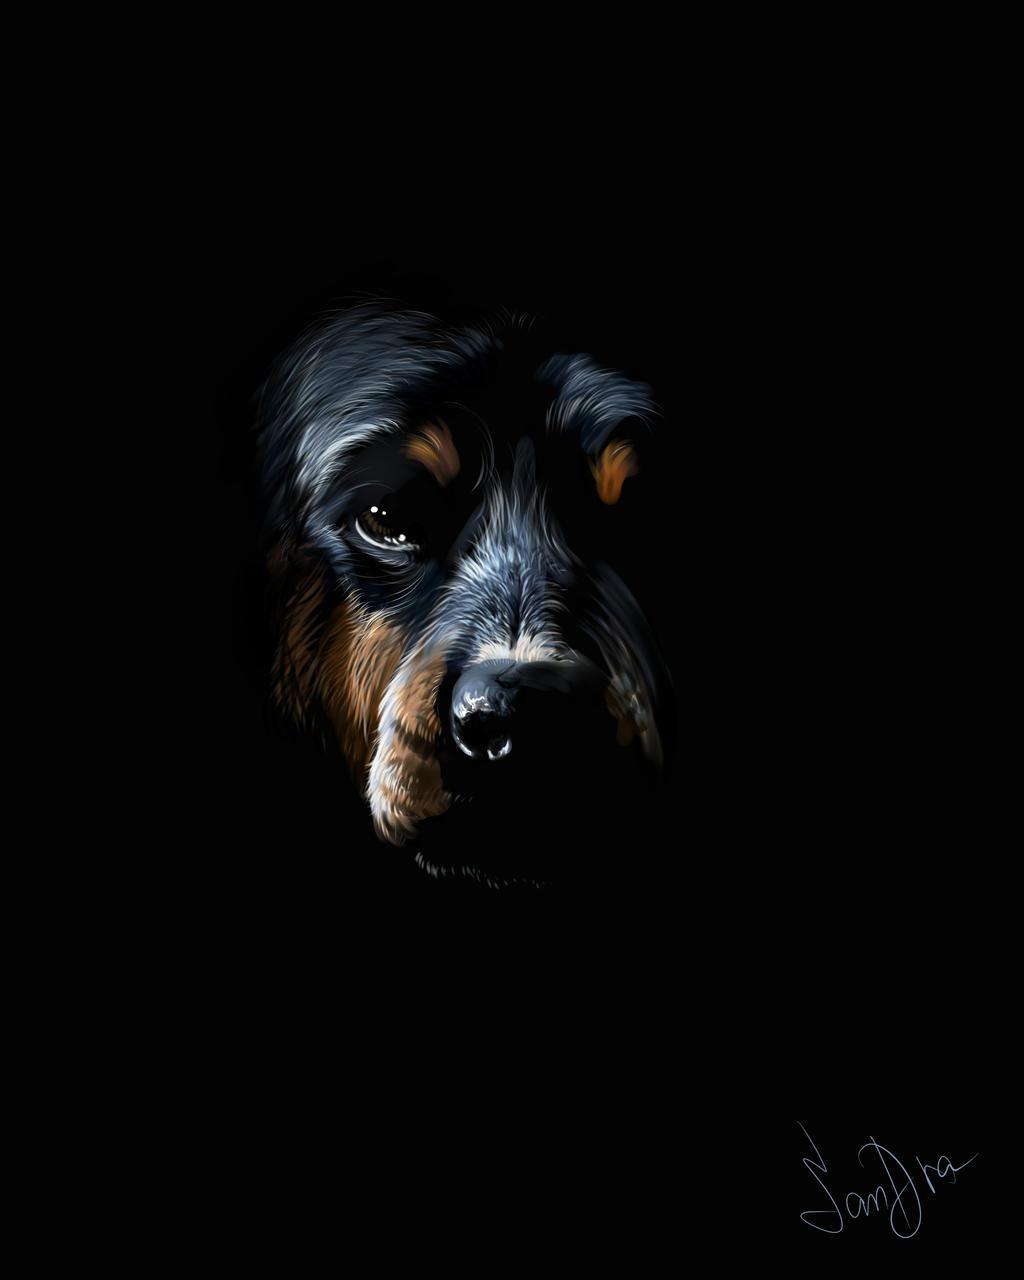 Rottweiler Wallpaper: Rottweiler In Darkness By SalamanDra-S On DeviantArt